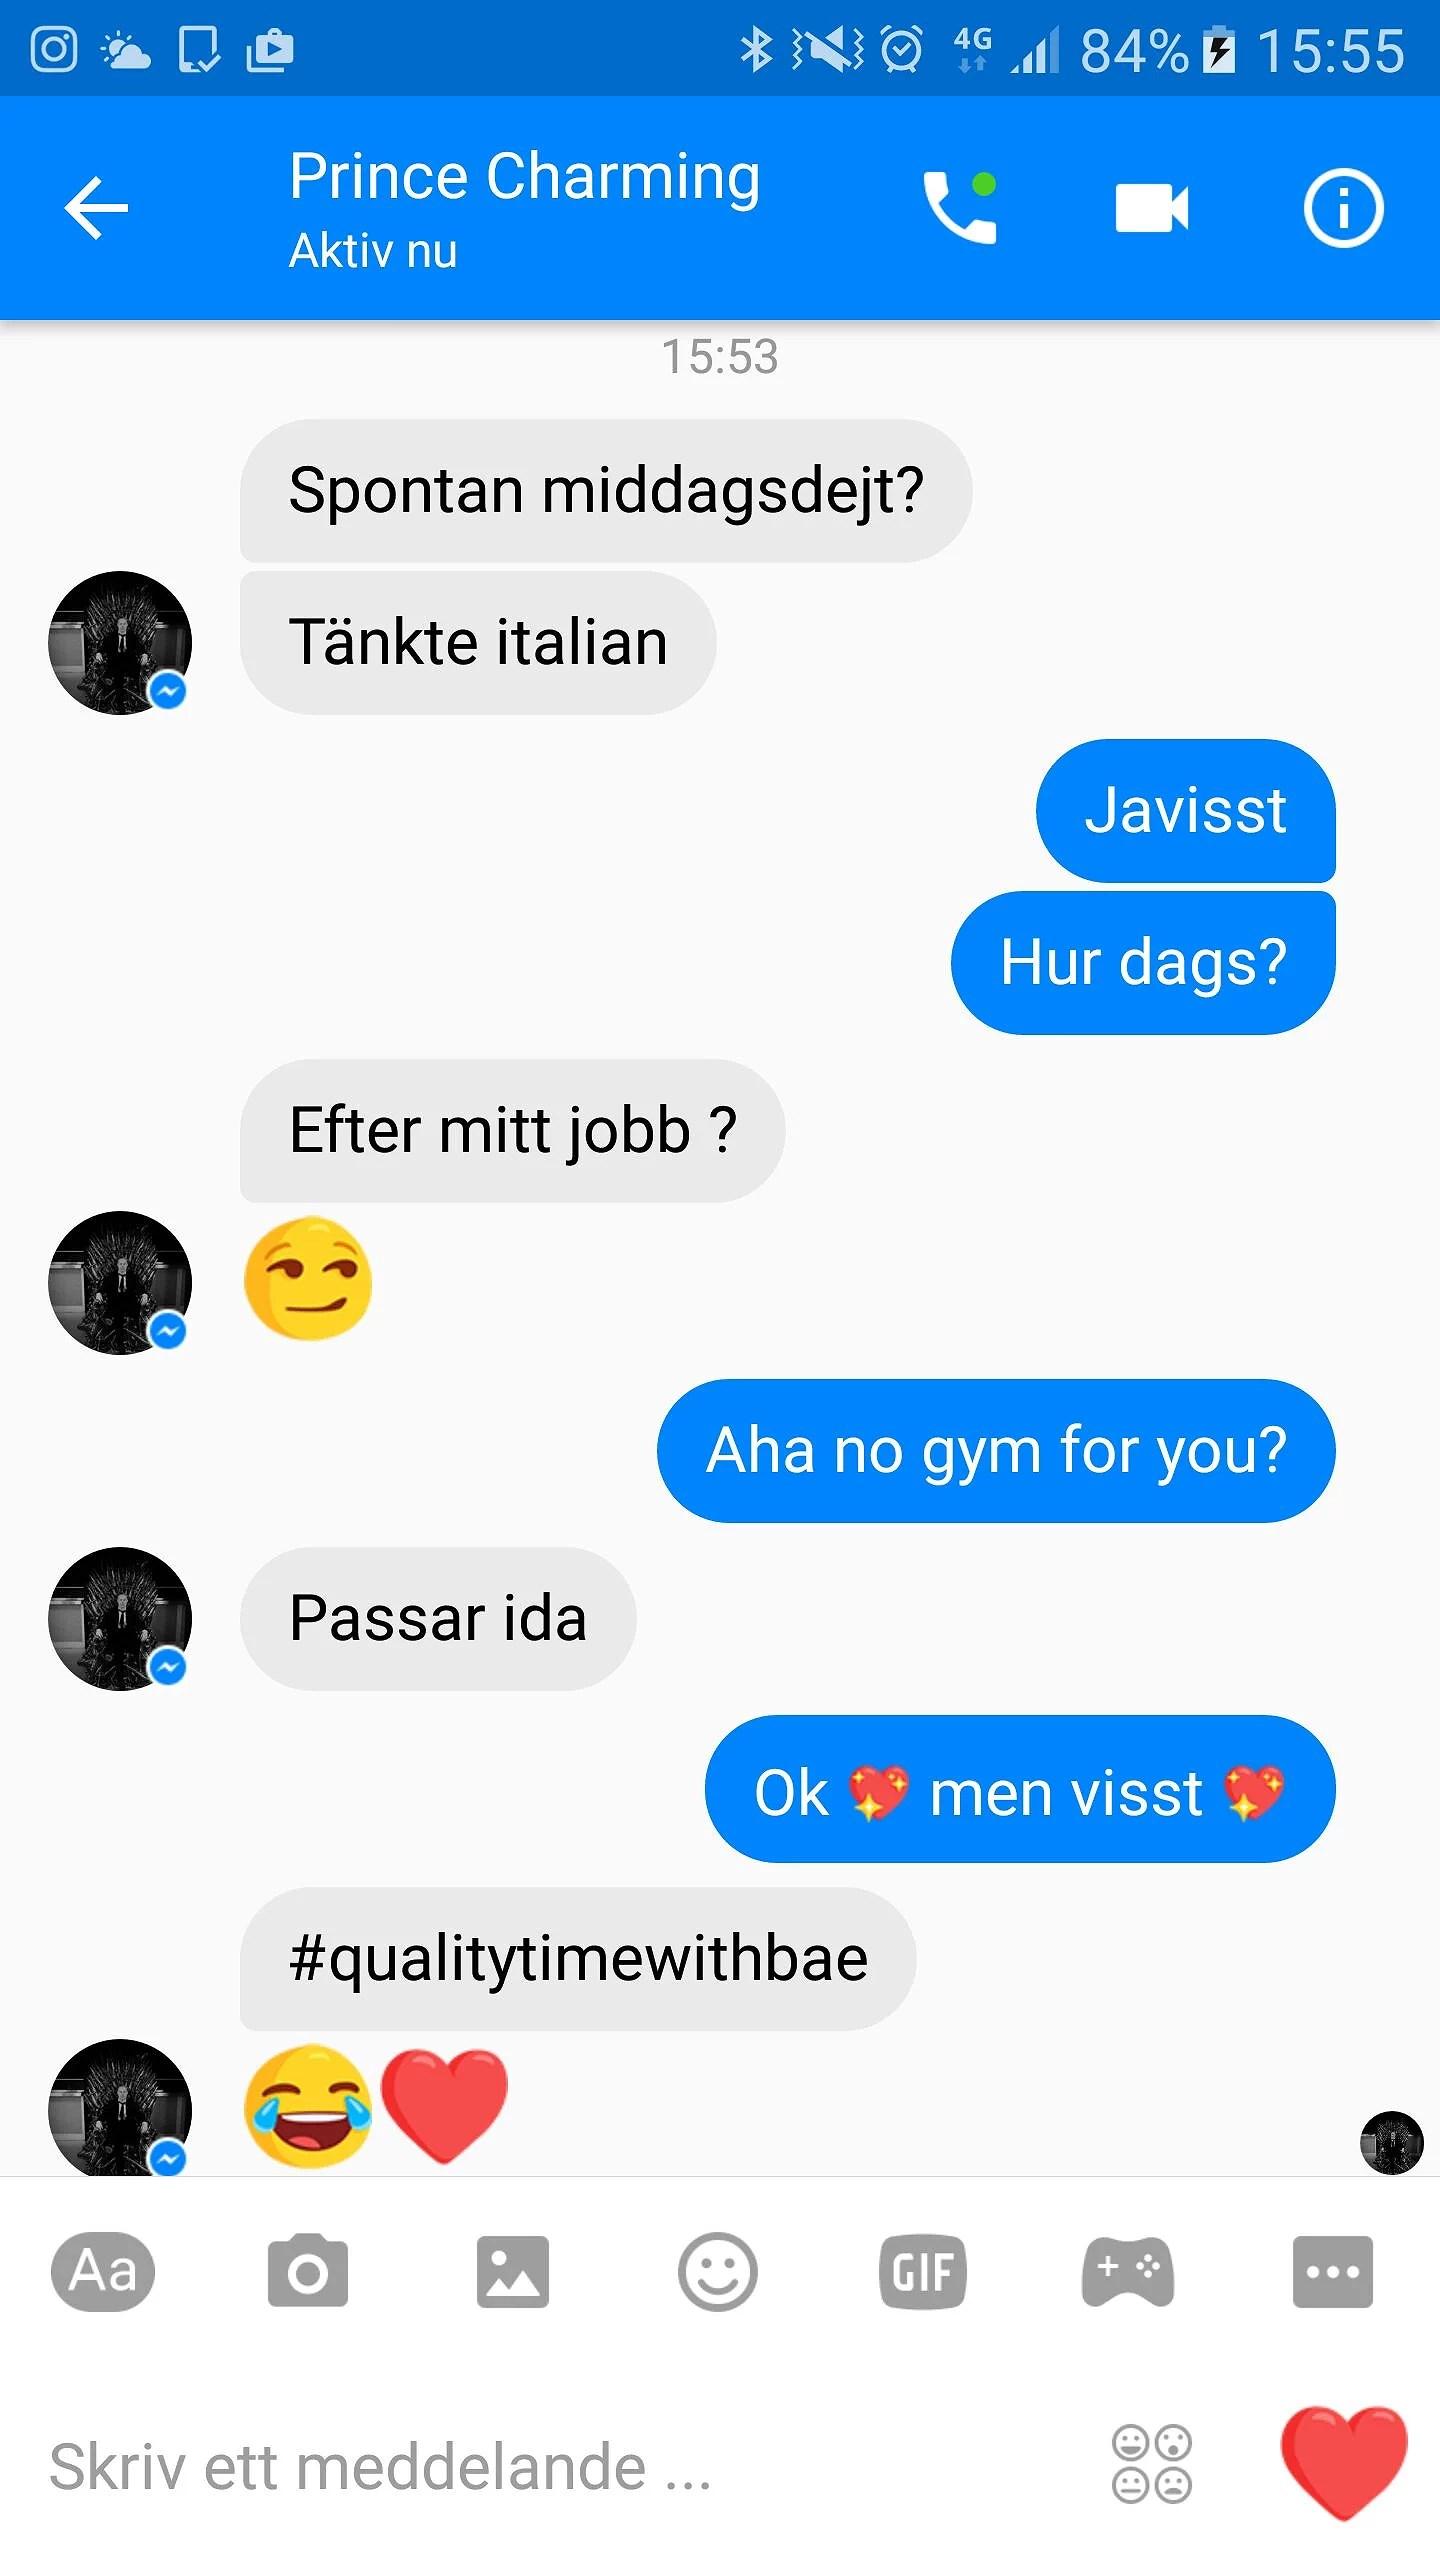 CrossFit dating Storbritannien